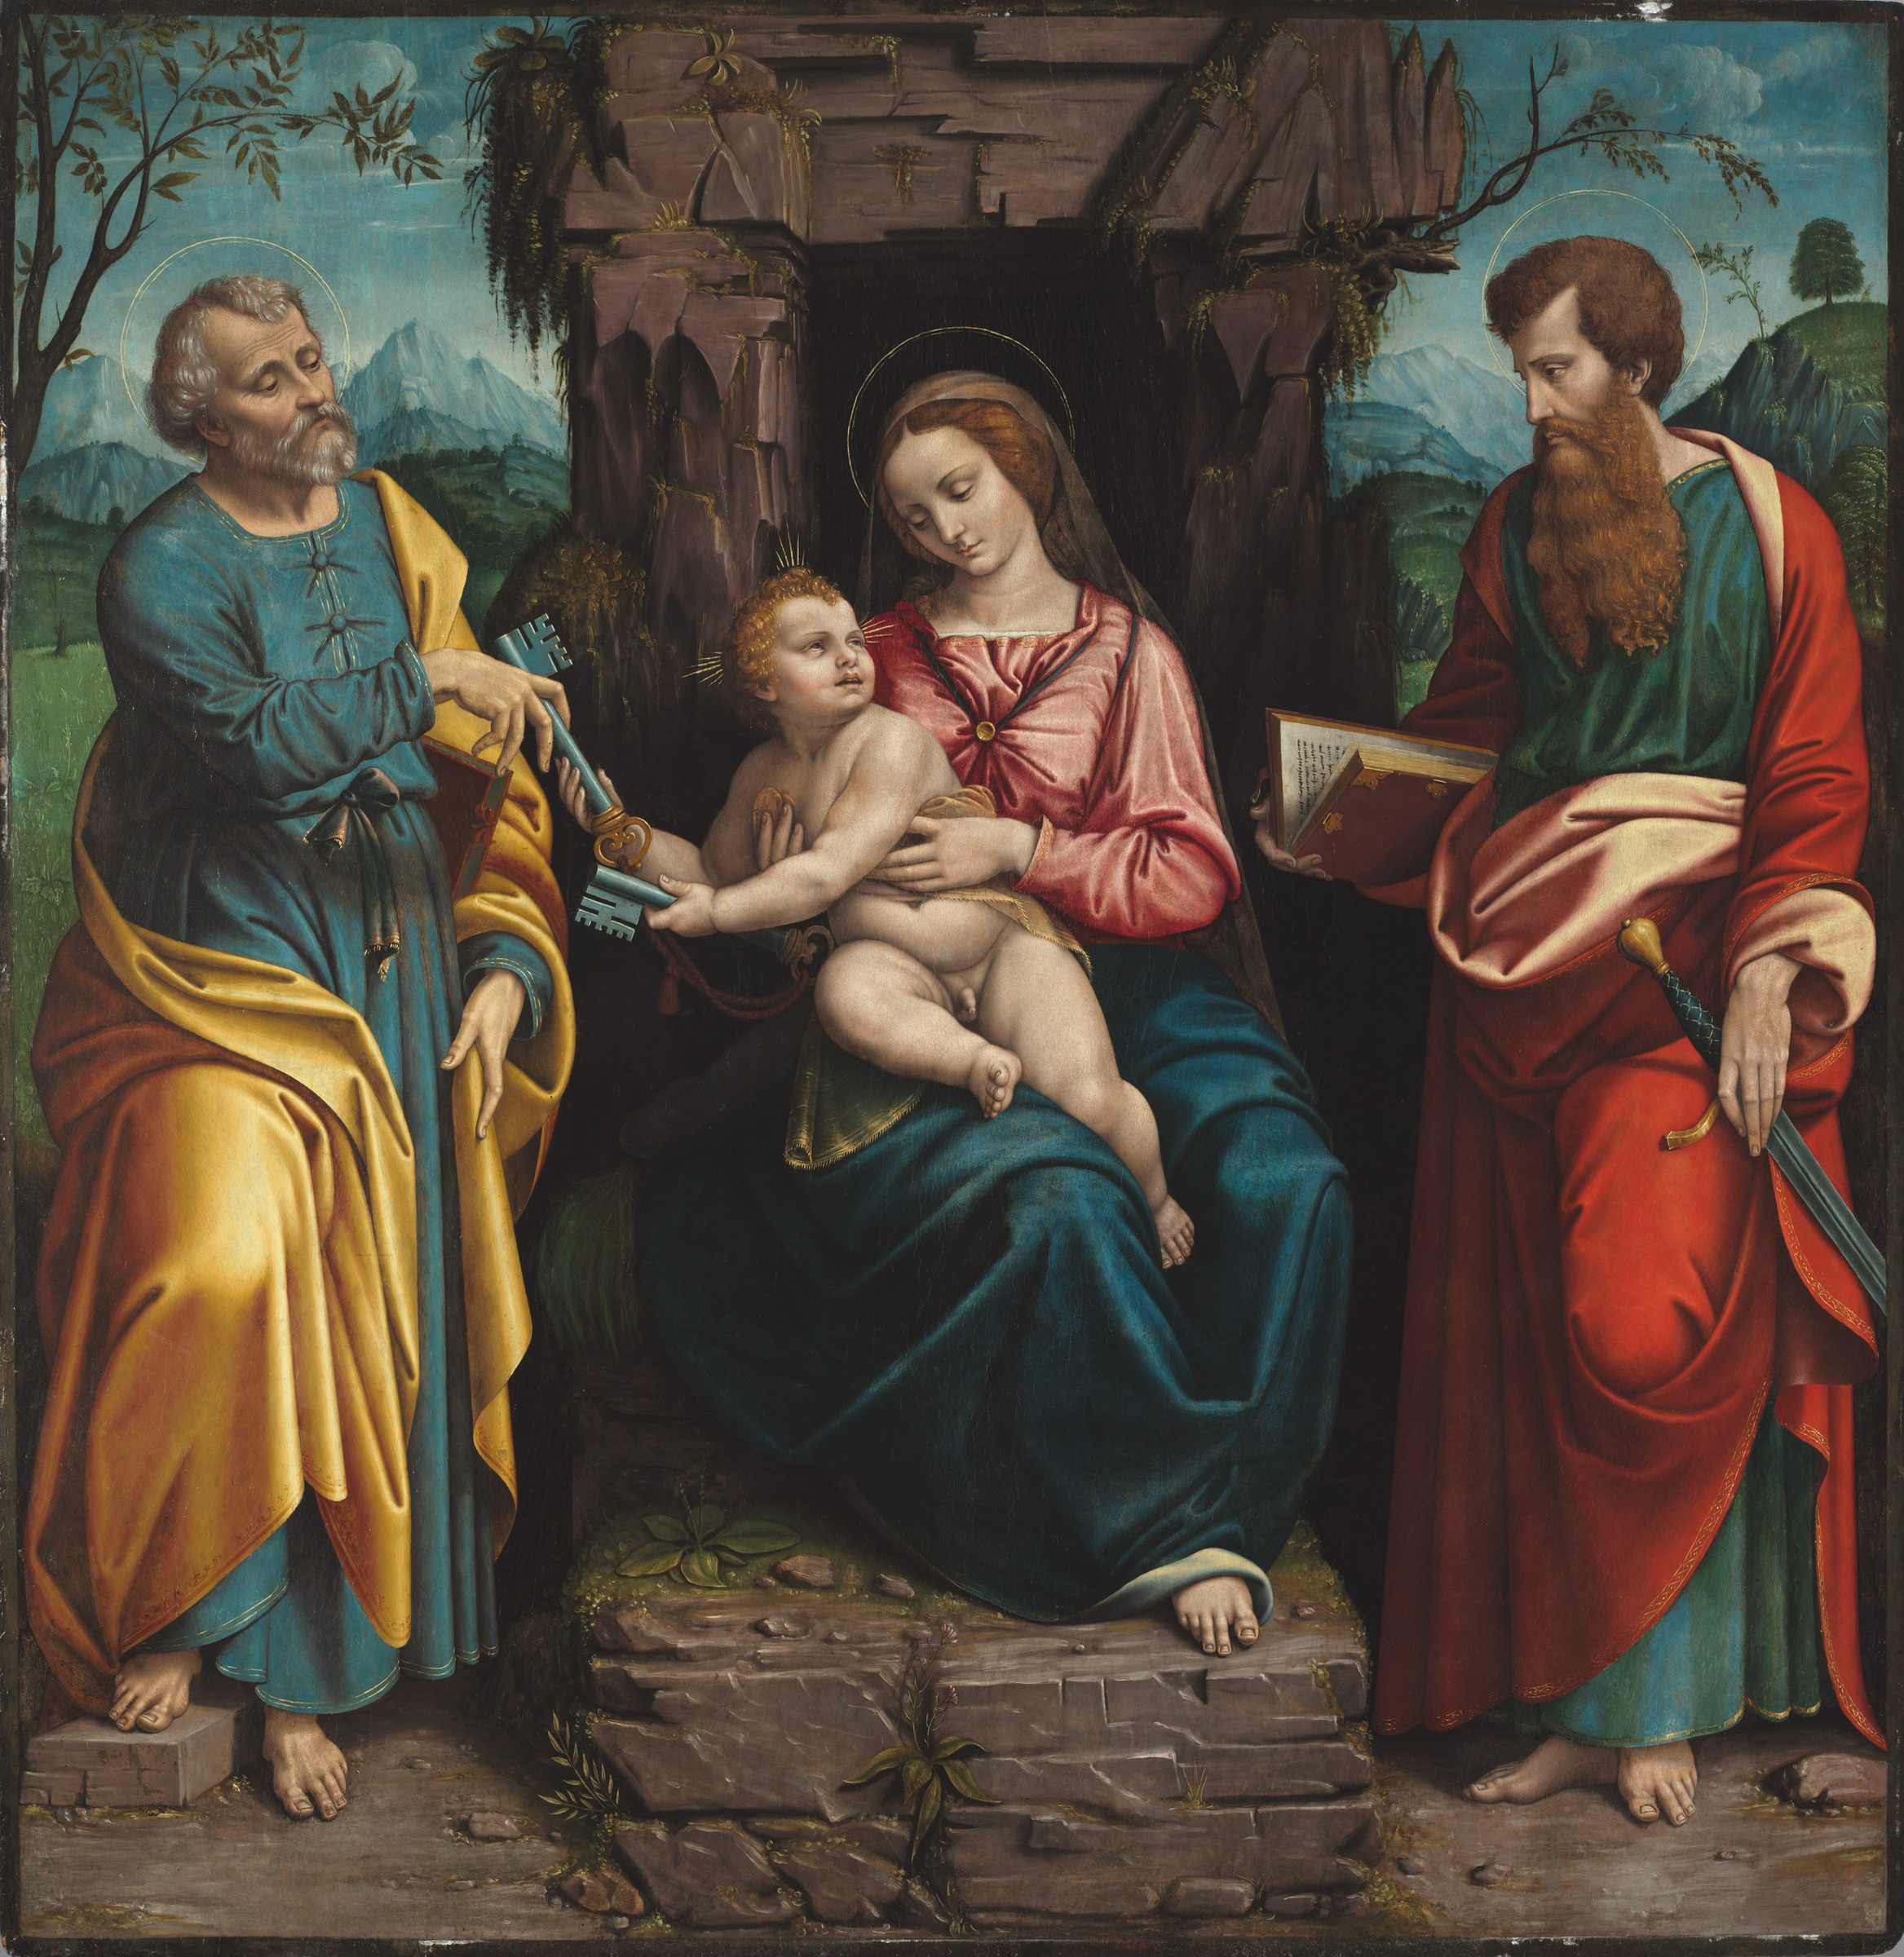 The Virgin and Child with Saints Peter and Paul, by Girolamo Figino, c. 16th century. Fogg Art Museum, Boston, Massachusetts, United States. Via IllustratedPrayer.com